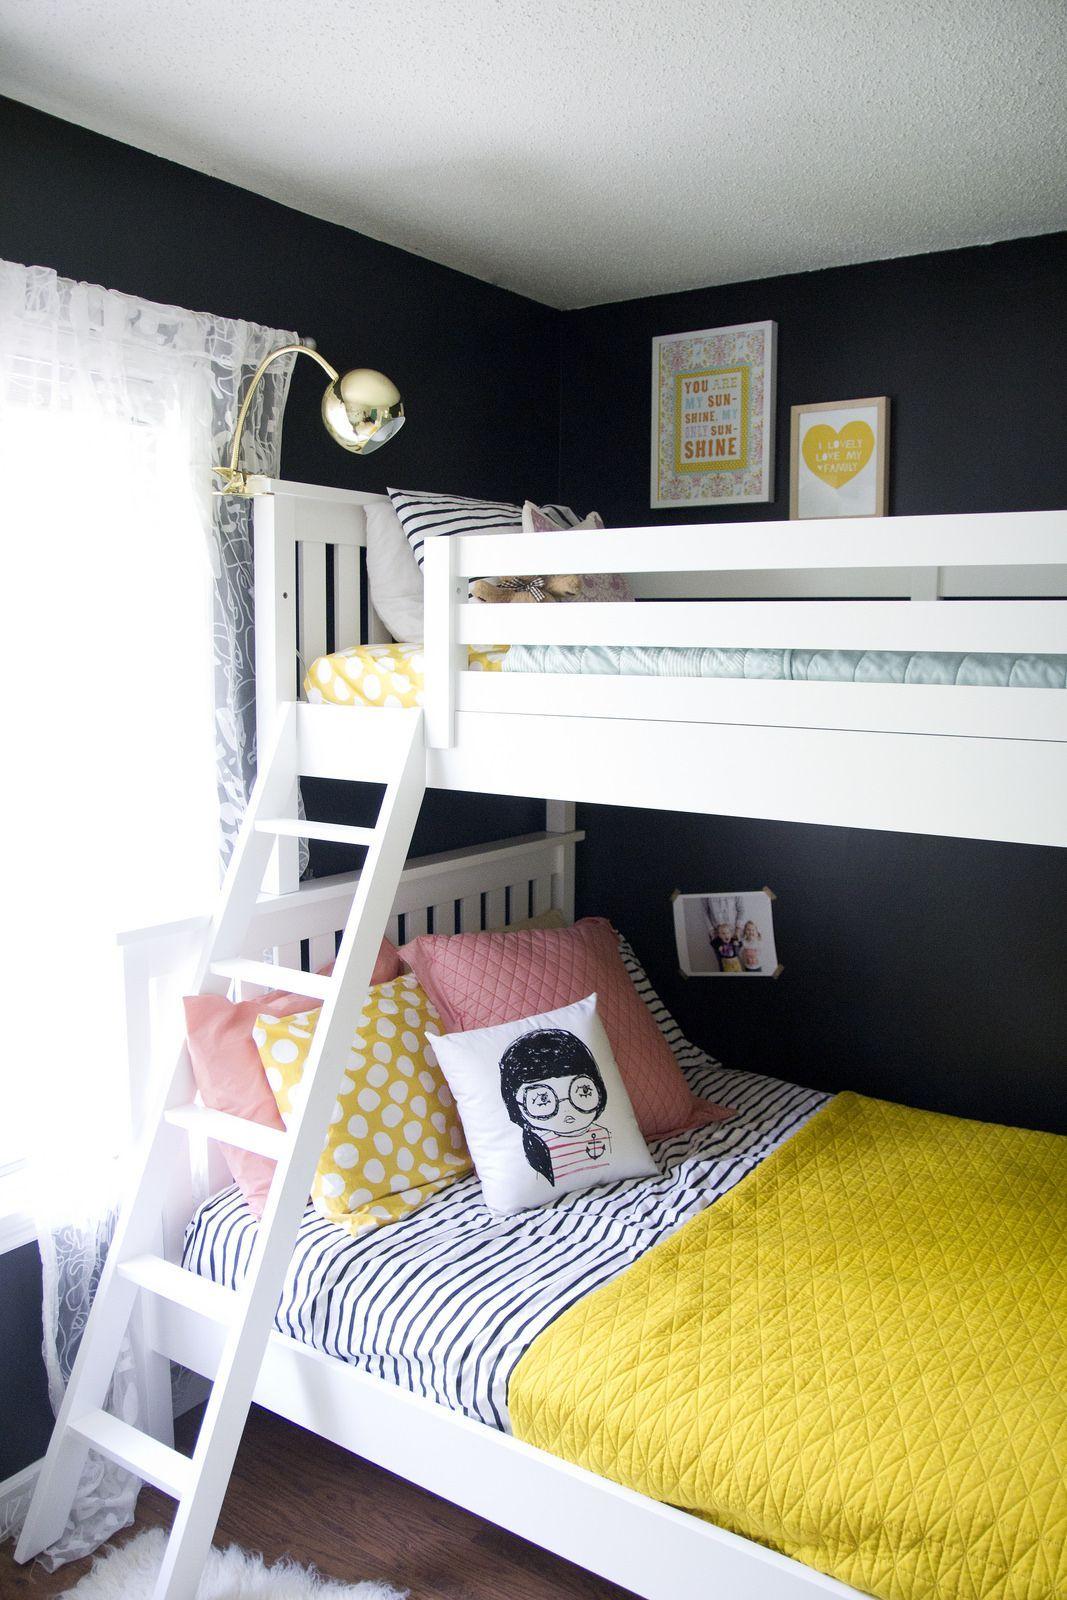 Pin By Yevette Kiah On Bunk Girl Room Modern Bunk Beds Bedroom Loft